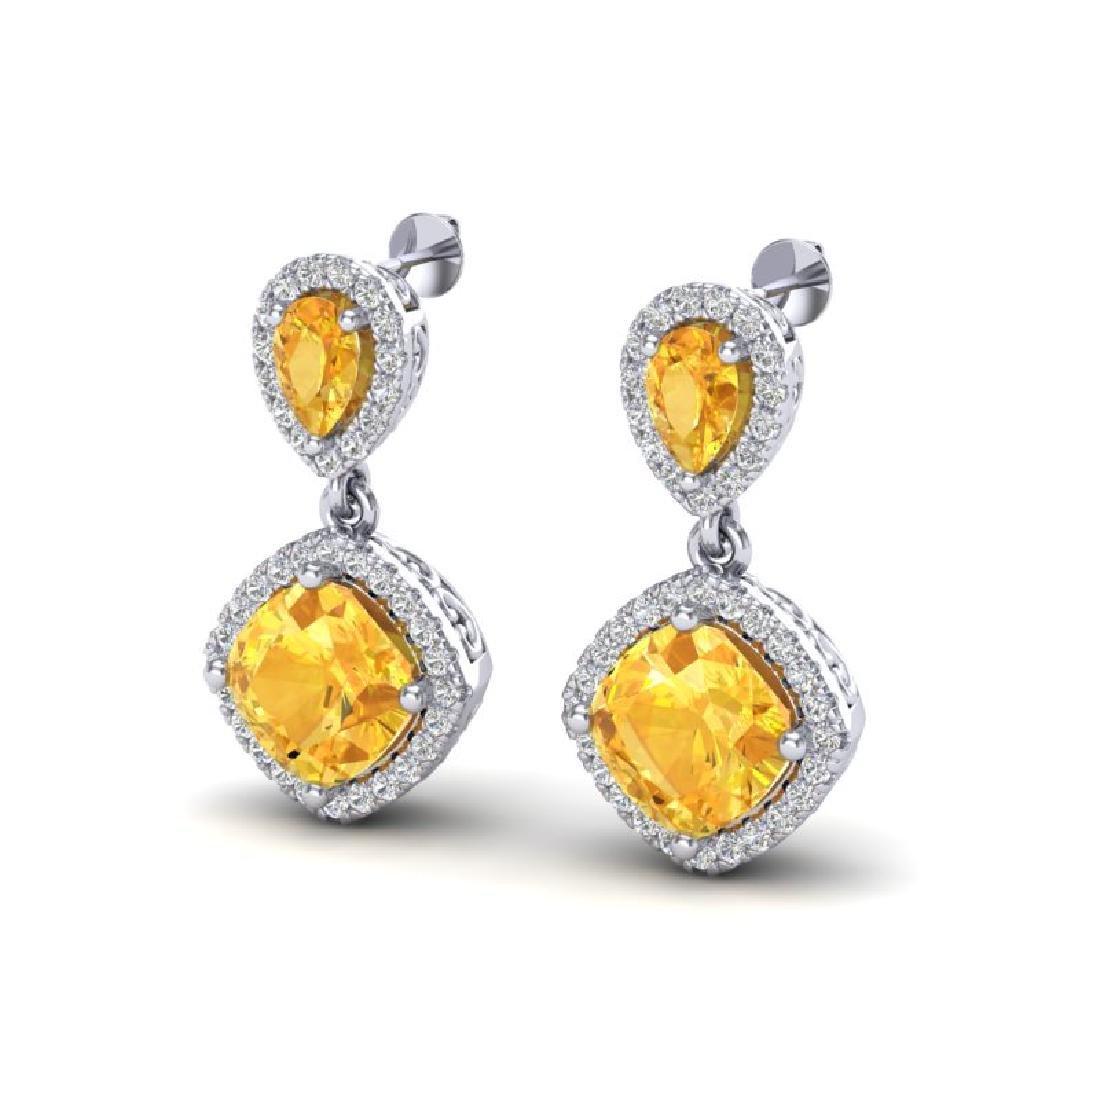 5 CTW Citrine & Micro Pave VS/SI Diamond Earrings